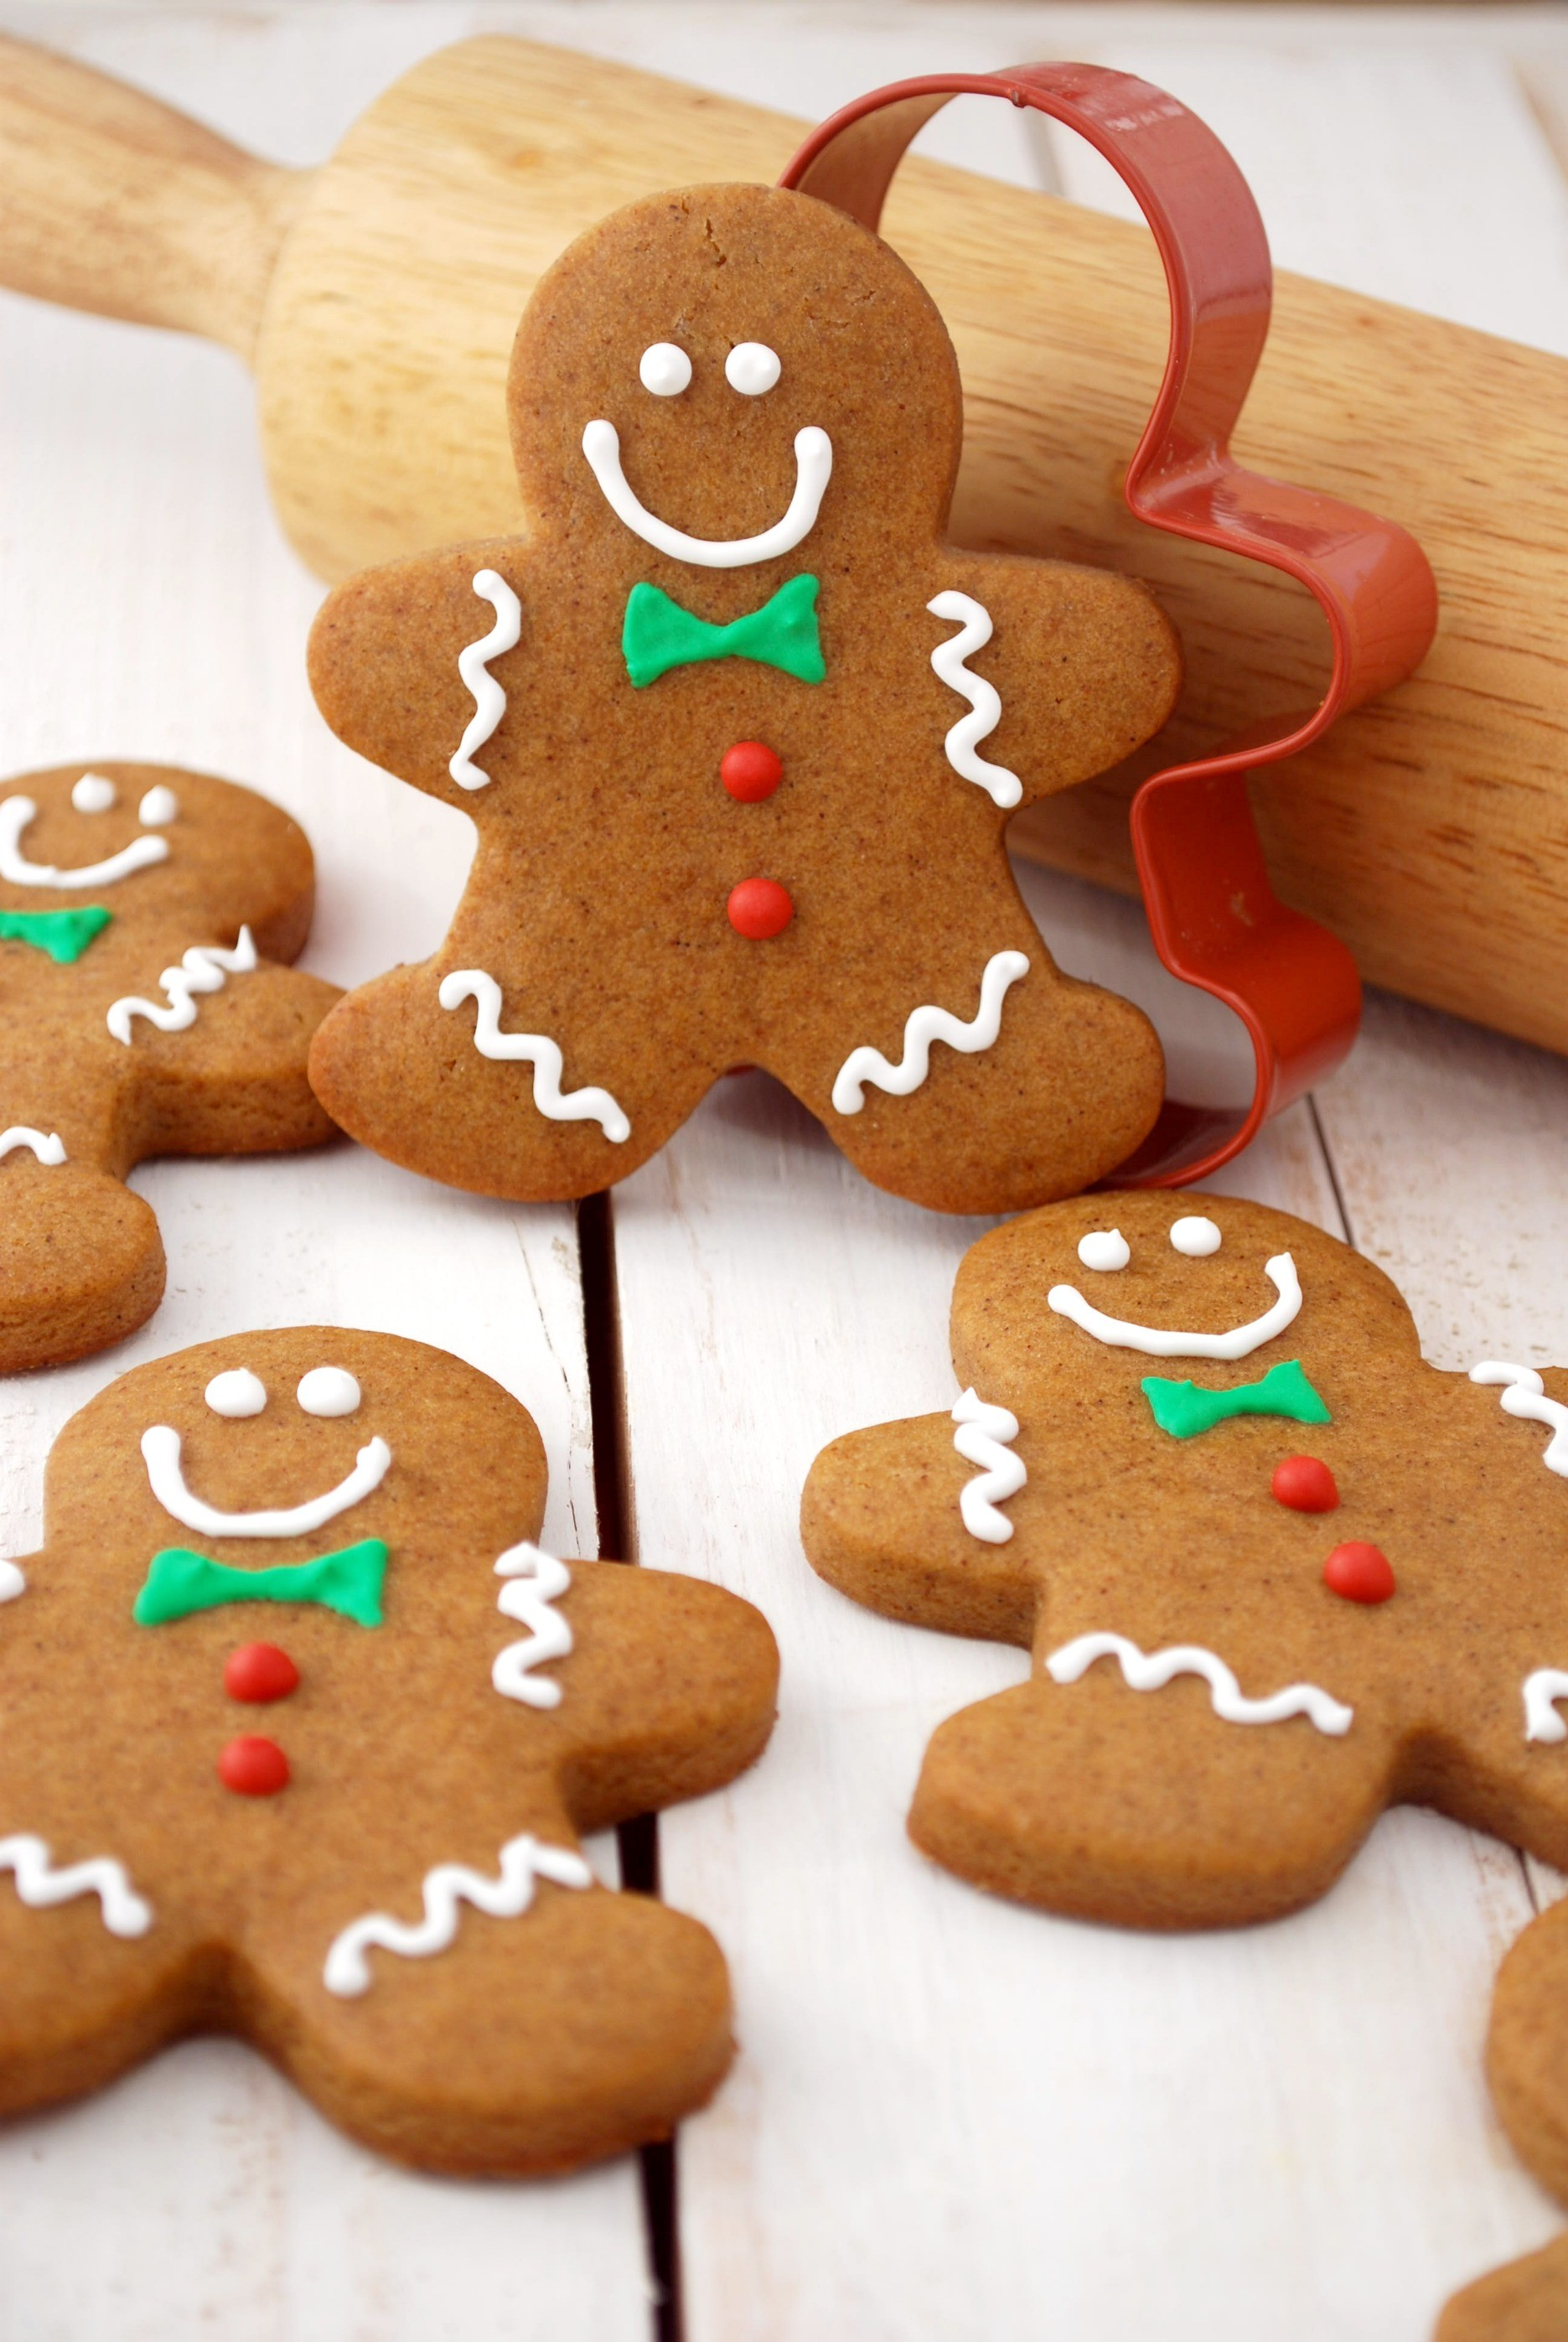 Gingerbread Man Wallpaper 51+ images